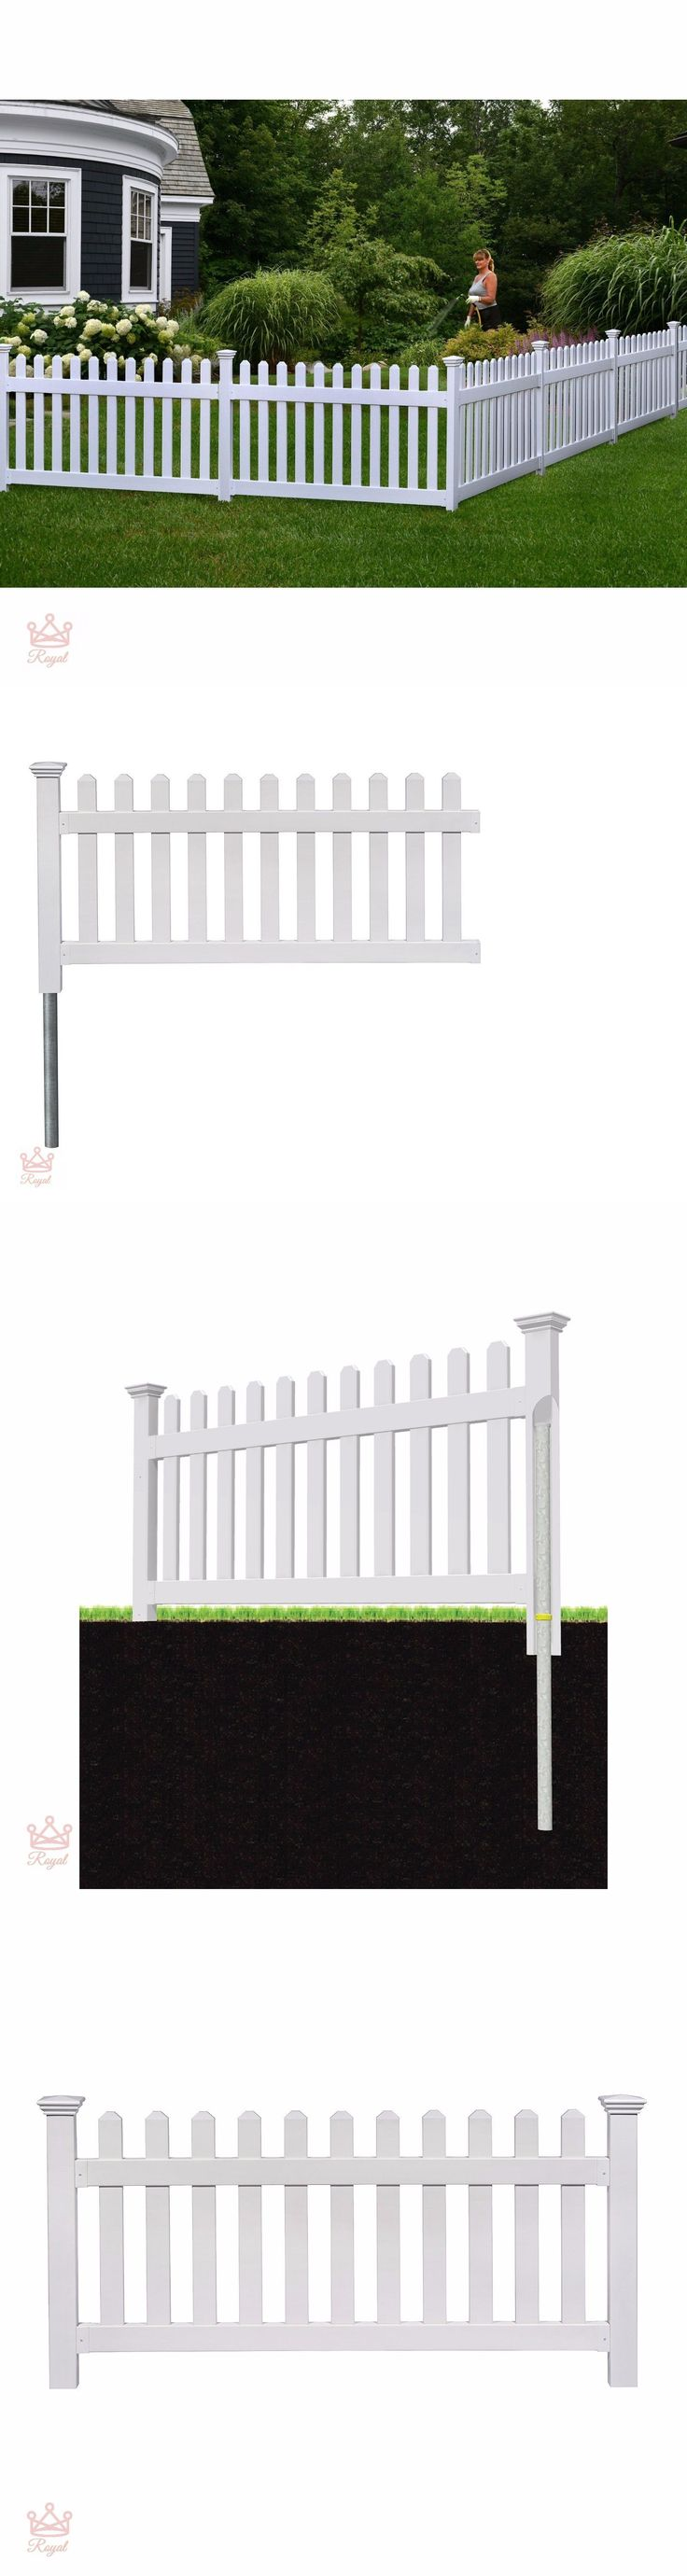 As 166 melhores imagens em fence pickets 180986 no pinterest fence pickets 180986 portable dog fence outdoor pet white vinyl gate no dig corner picket baanklon Images